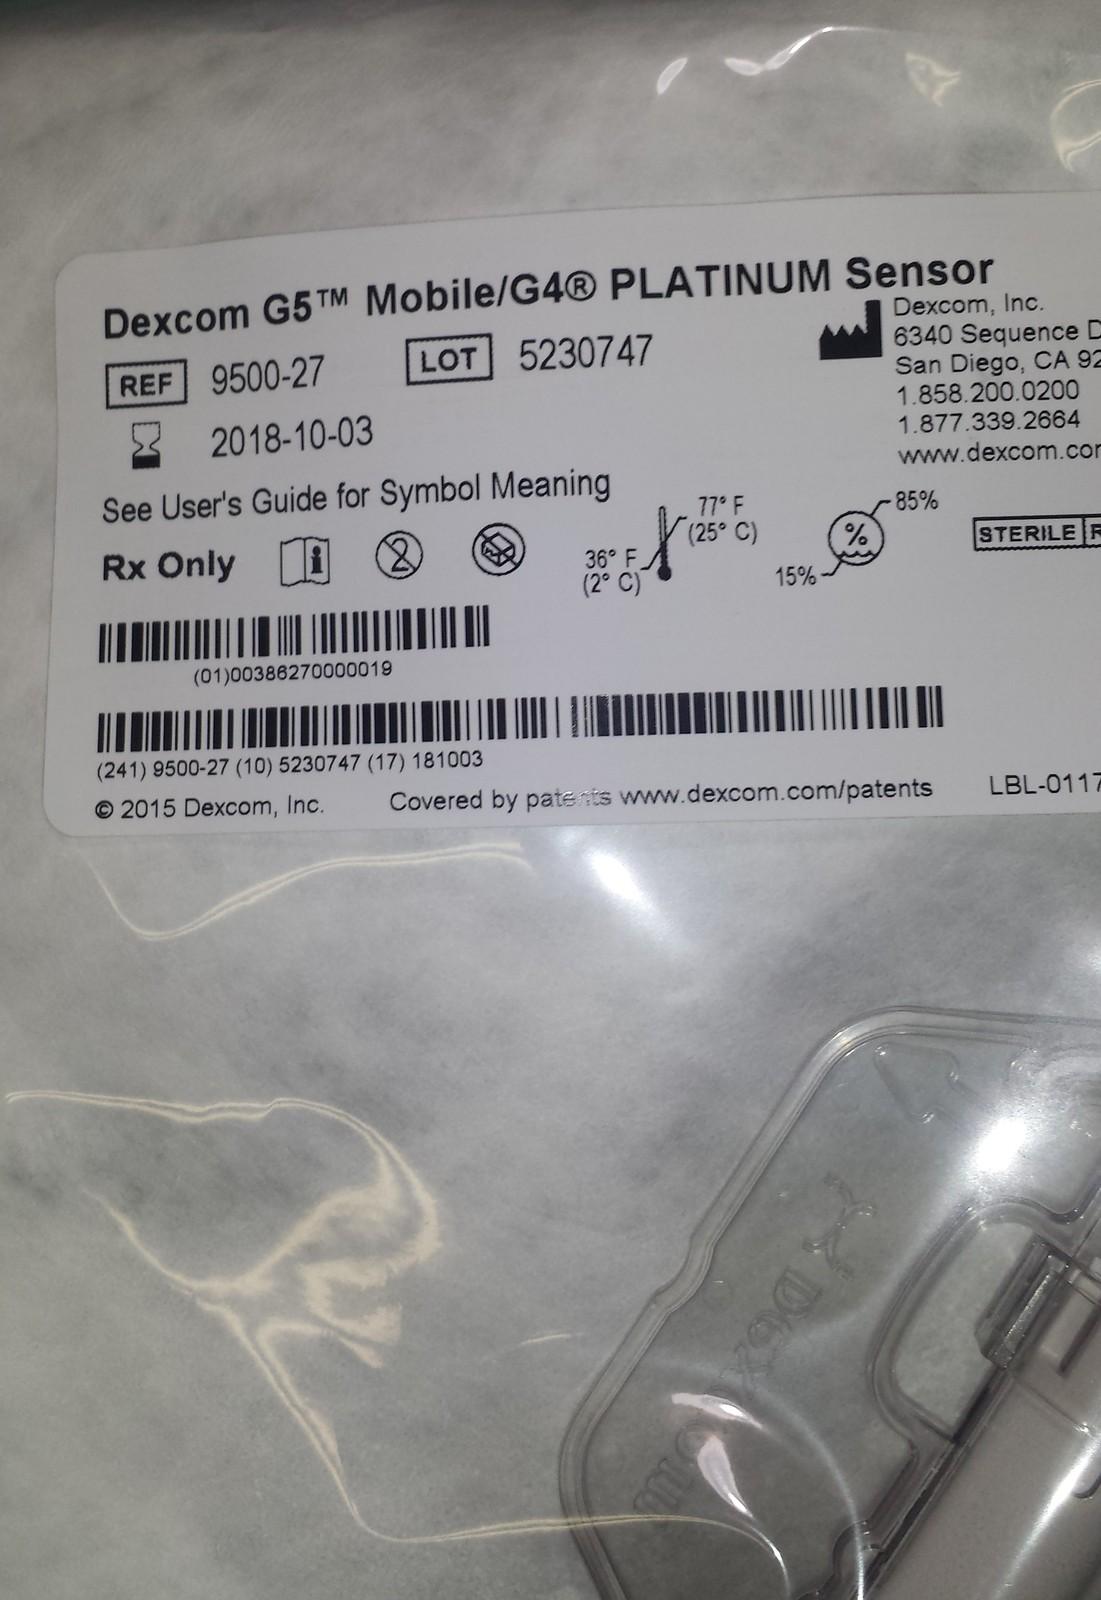 Two Dexcom G5 Mobile G4 Platinum Sensors And Similar Items